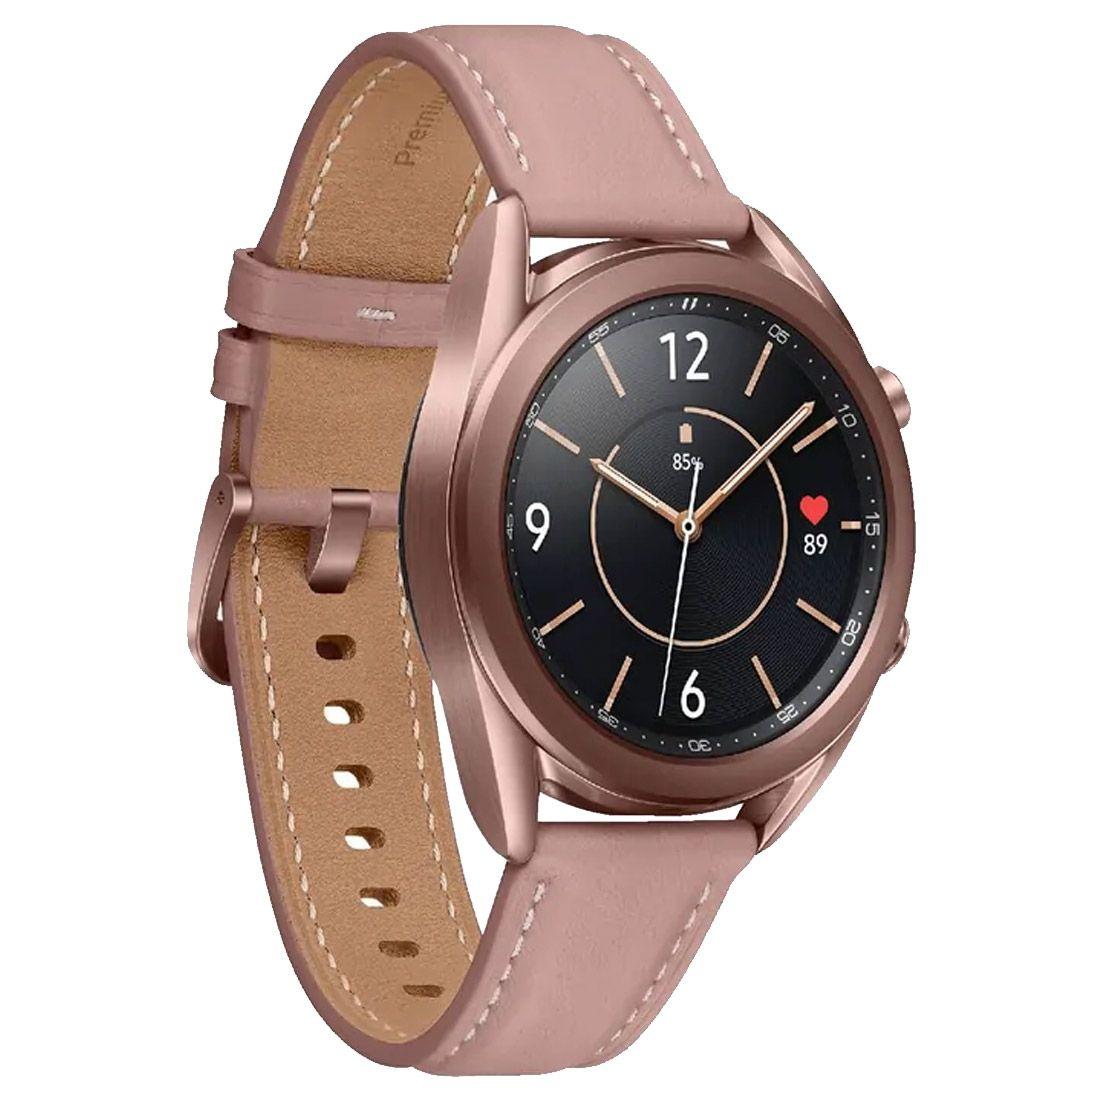 Samsung Galaxy Watch3 Bluetooth (41mm) Mystic Bronze